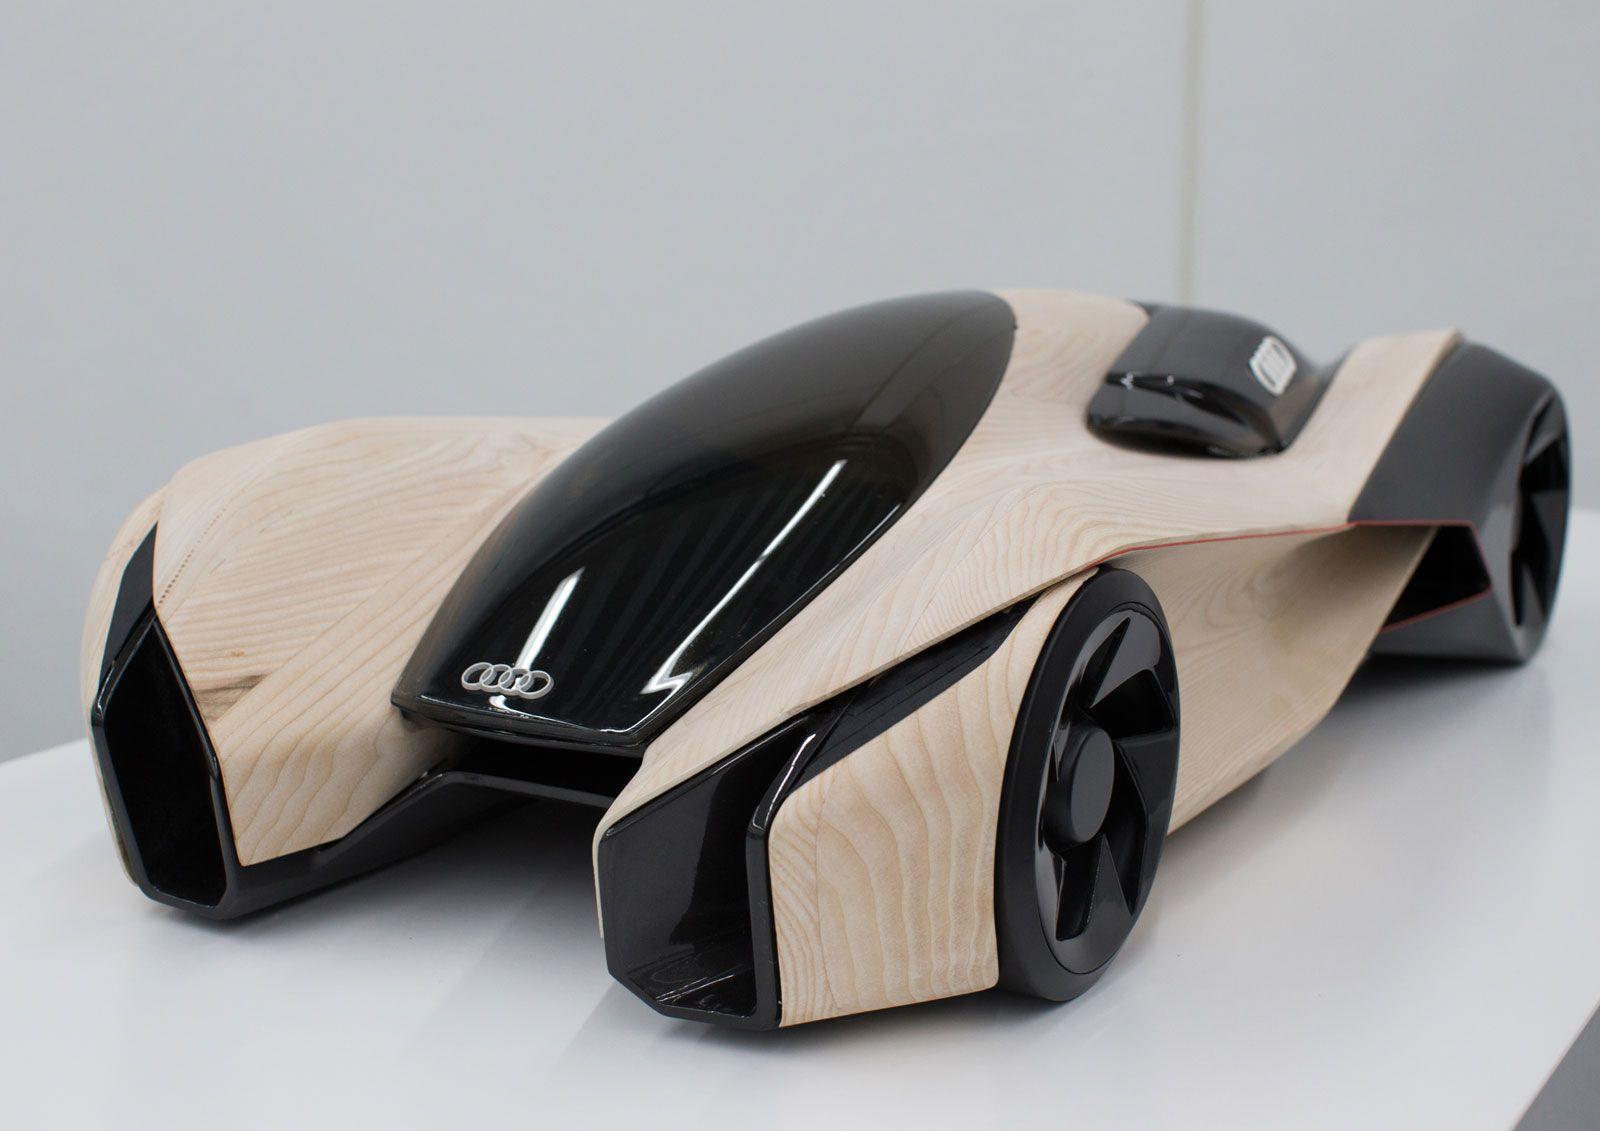 The Wood Audi Wood Aerodynamics Concept By Pavol Kirnag Concept Cars Concept Car Design Futuristic Cars